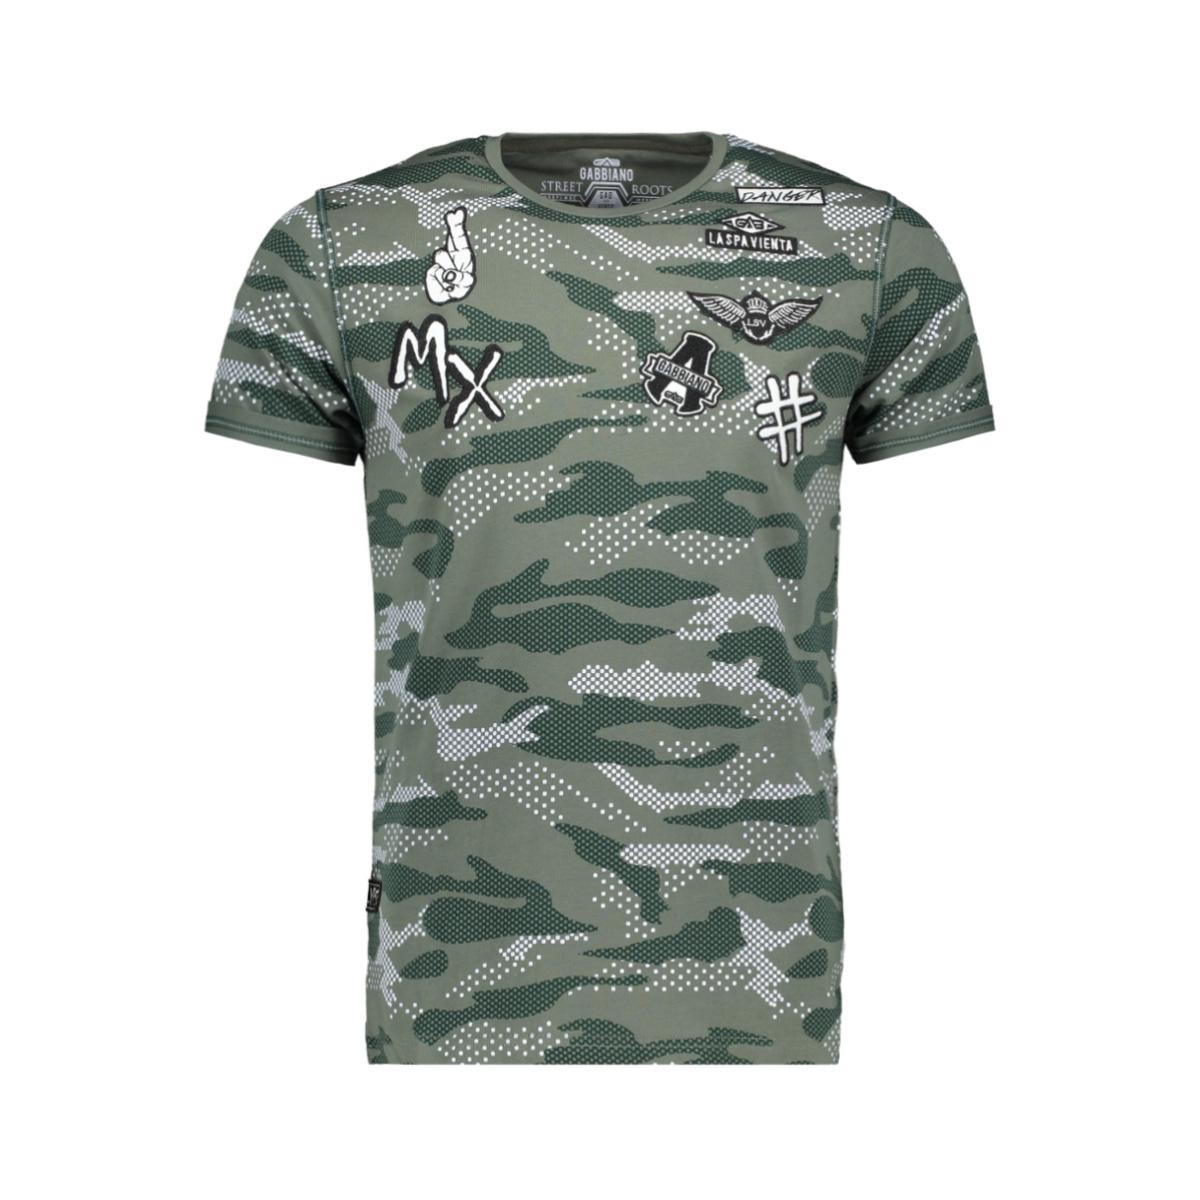 t shirt 13821 gabbiano t-shirt army